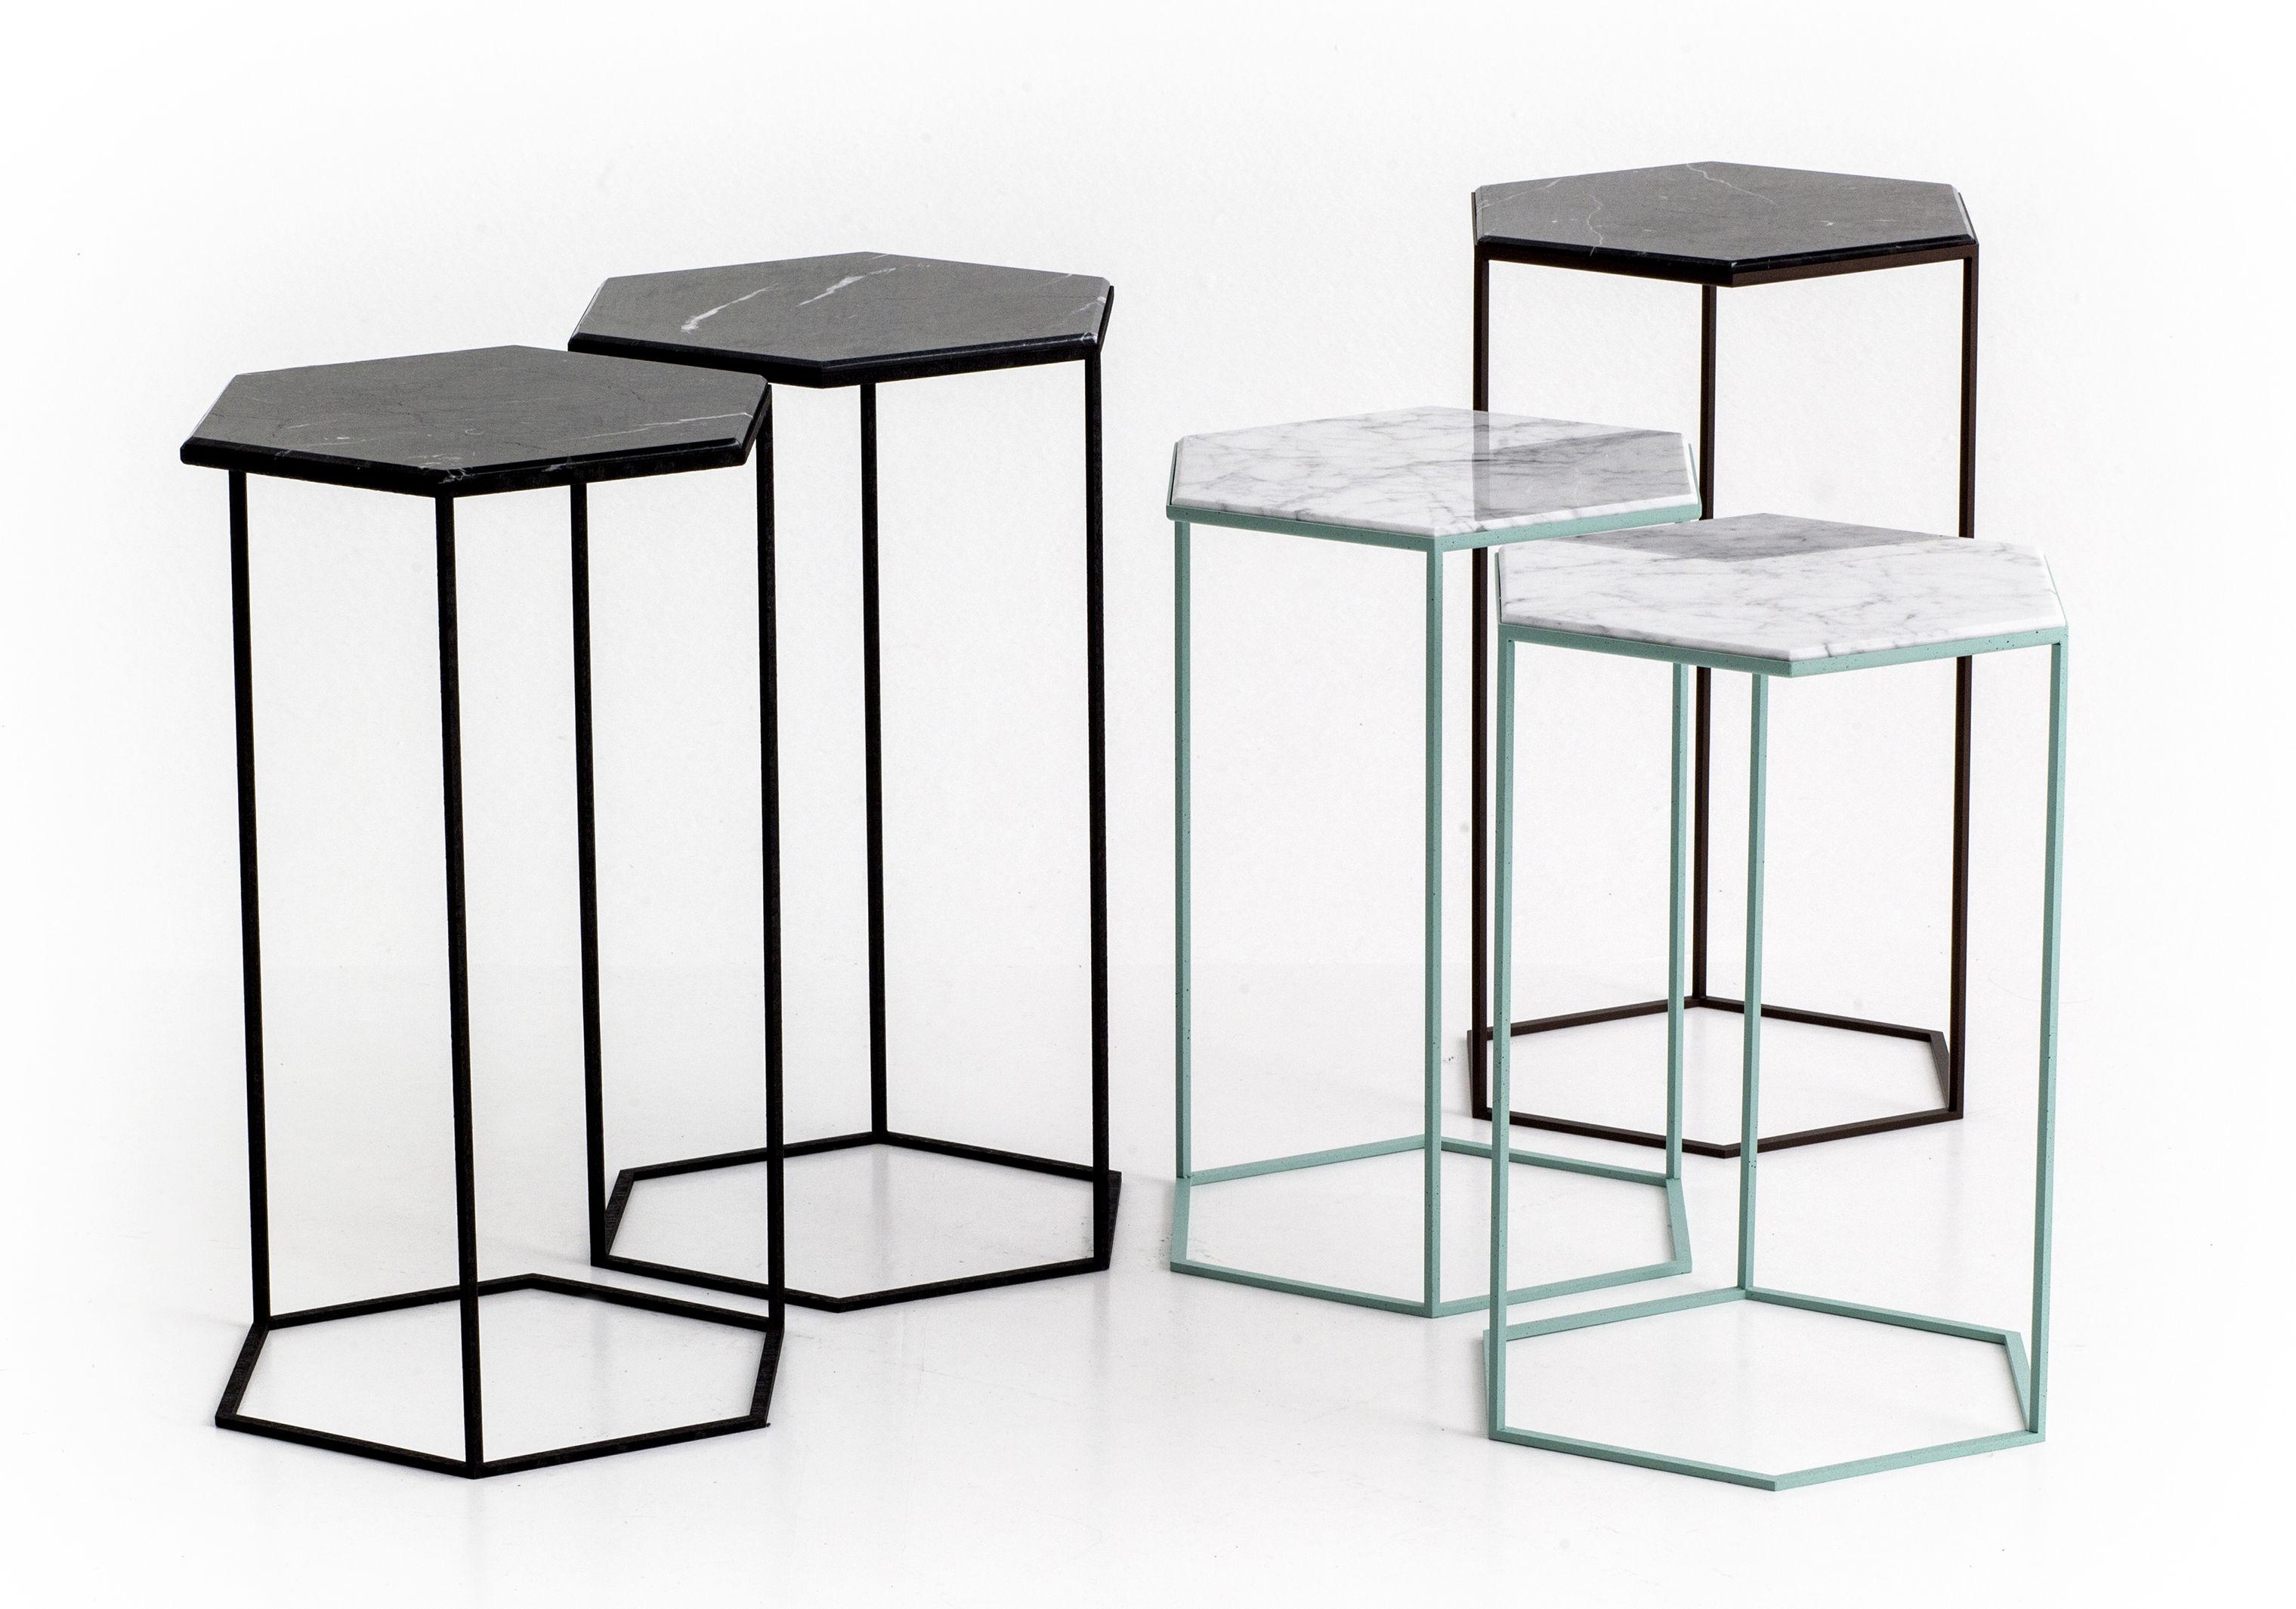 table d 39 appoint hexxed marbre h 50 cm marbre blanc base verte diesel with moroso. Black Bedroom Furniture Sets. Home Design Ideas